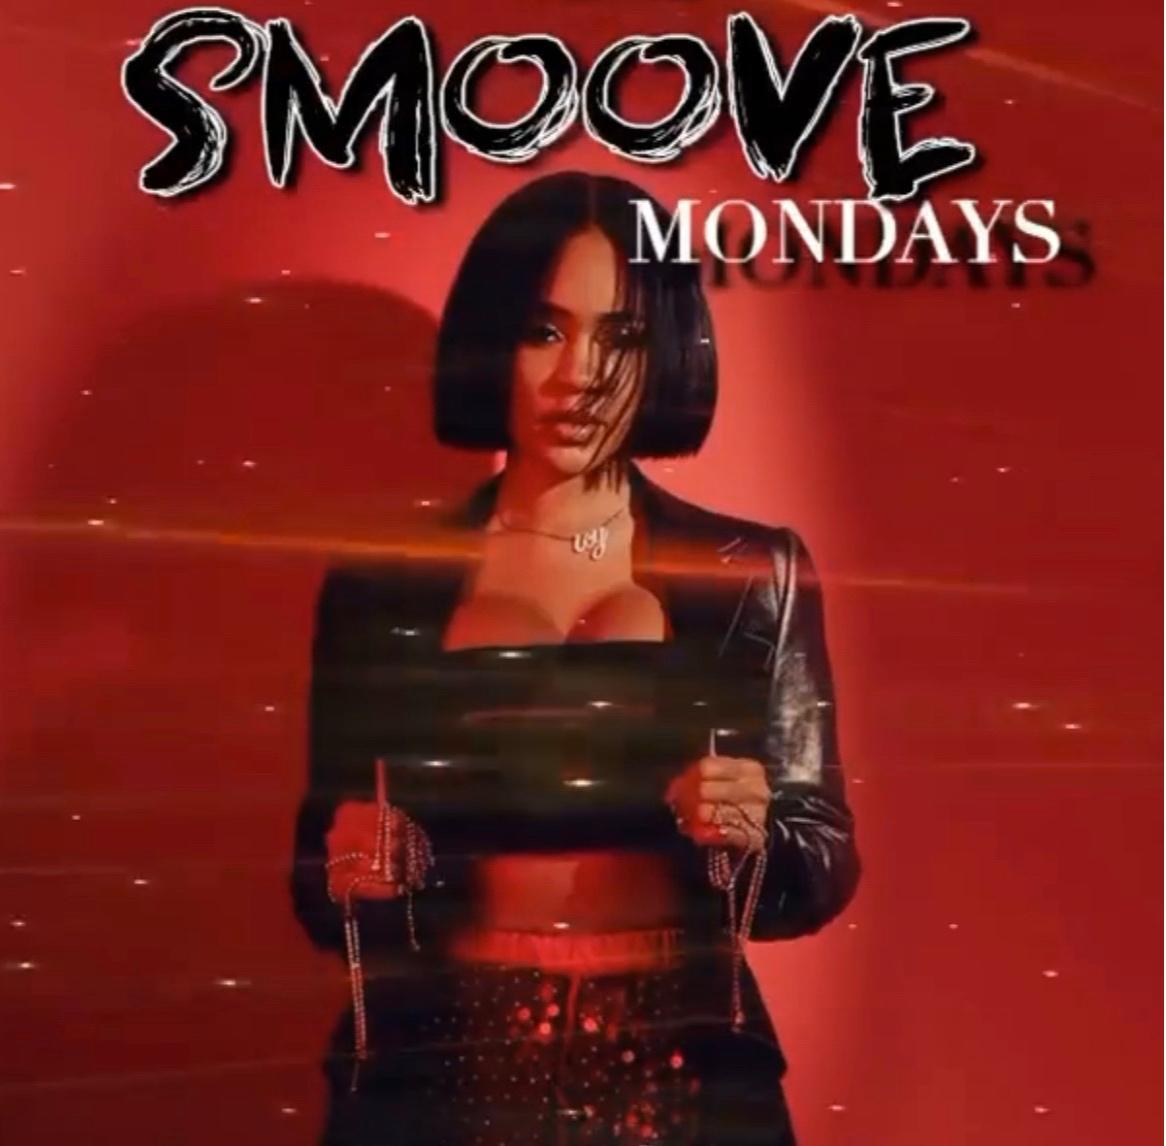 Smoove Mondays